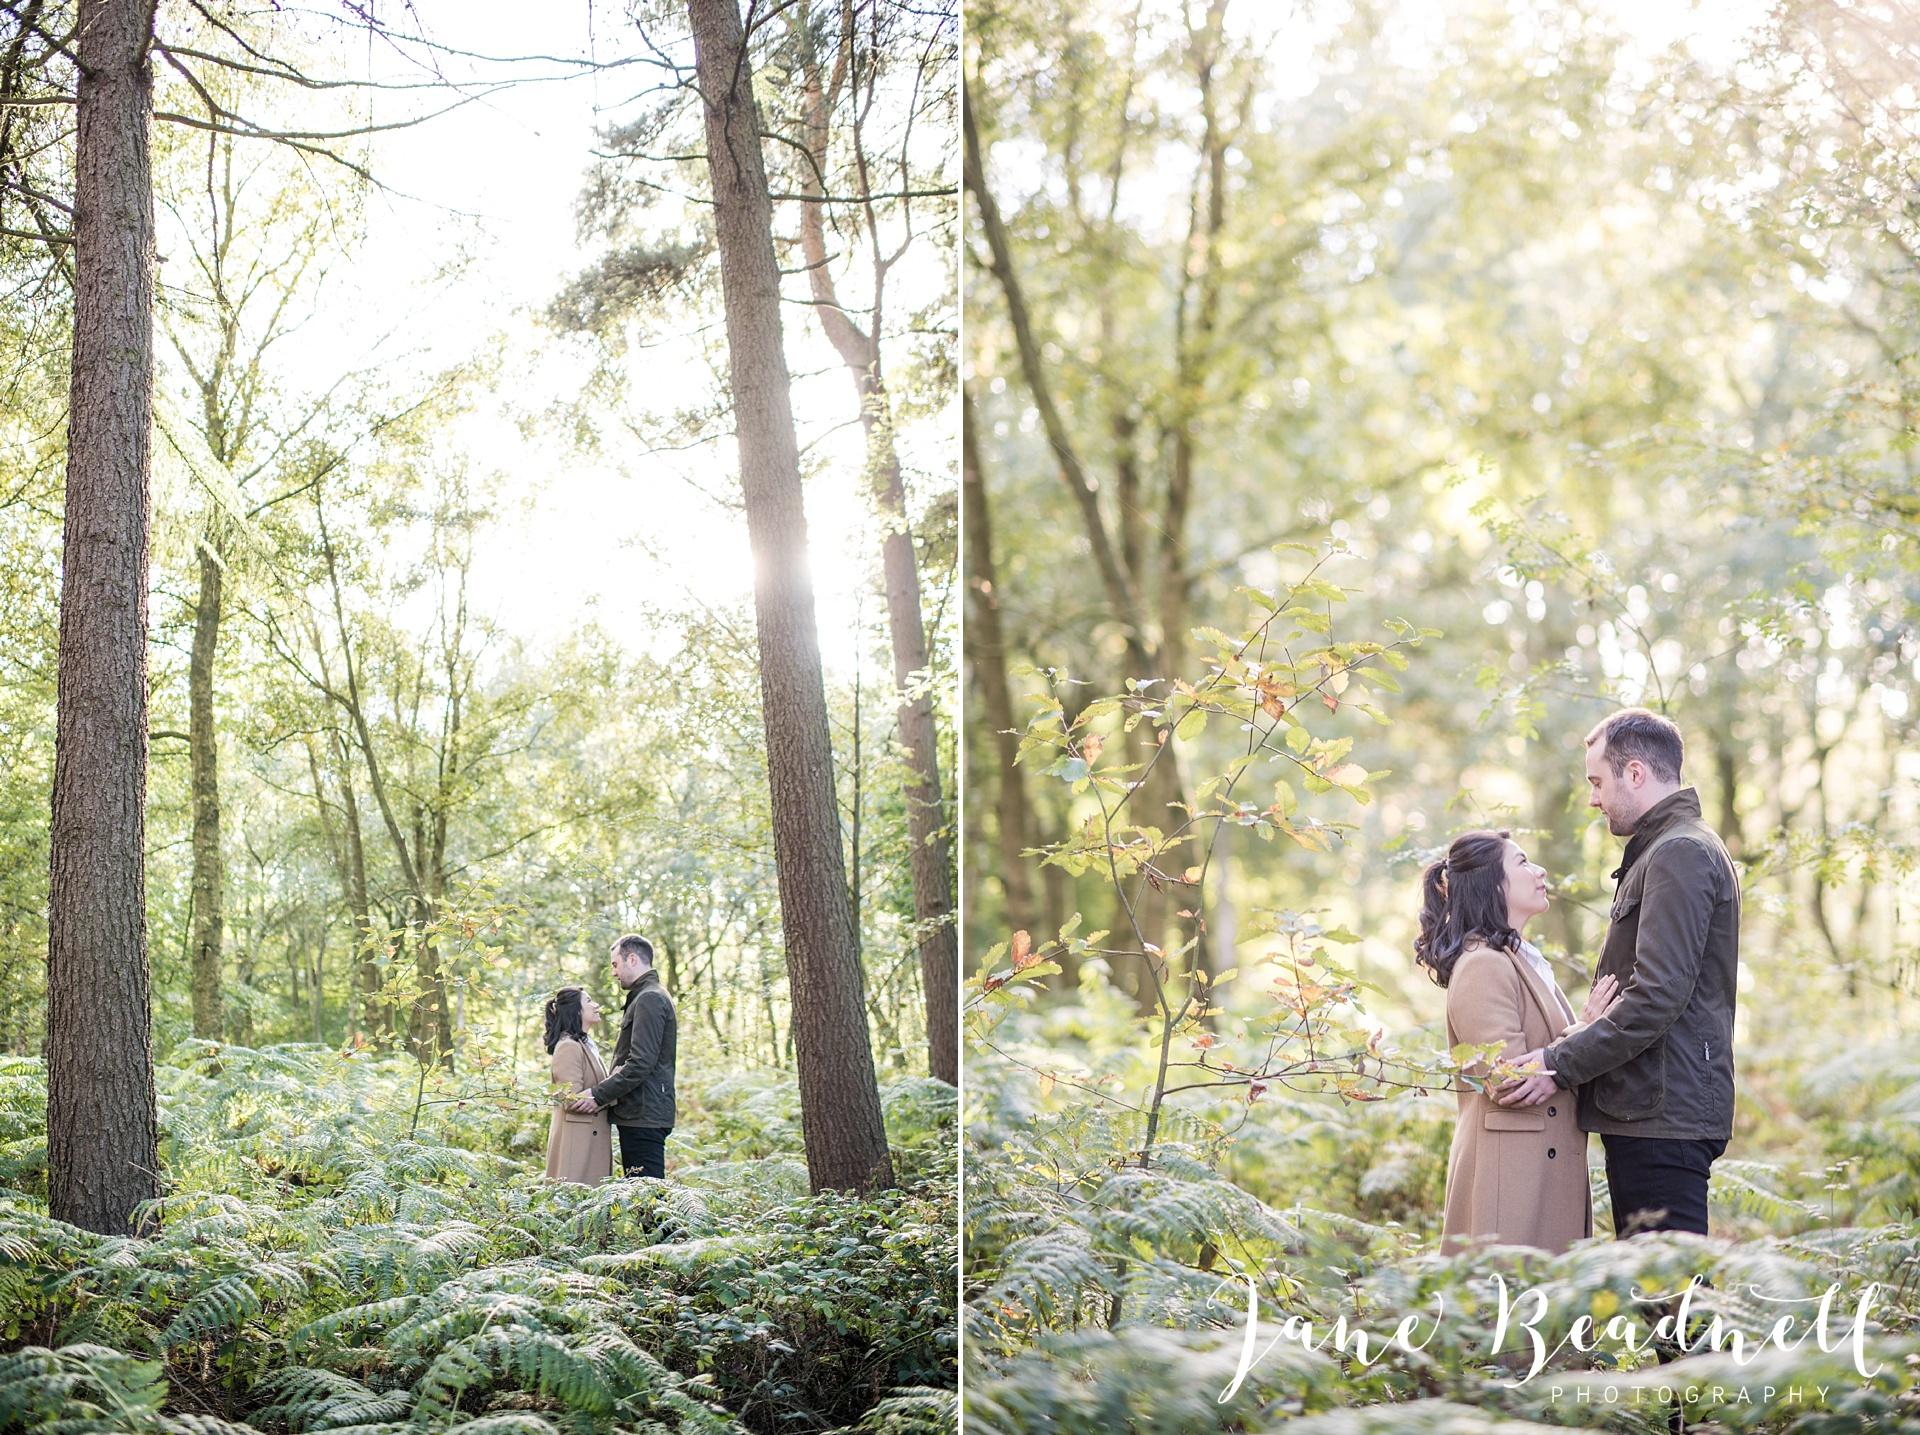 Yorkshire wedding photographer. Otley engagement photography. The Chevin, Leeds wedding photographer Jane Beadnell Photography. UK Wedding photographer